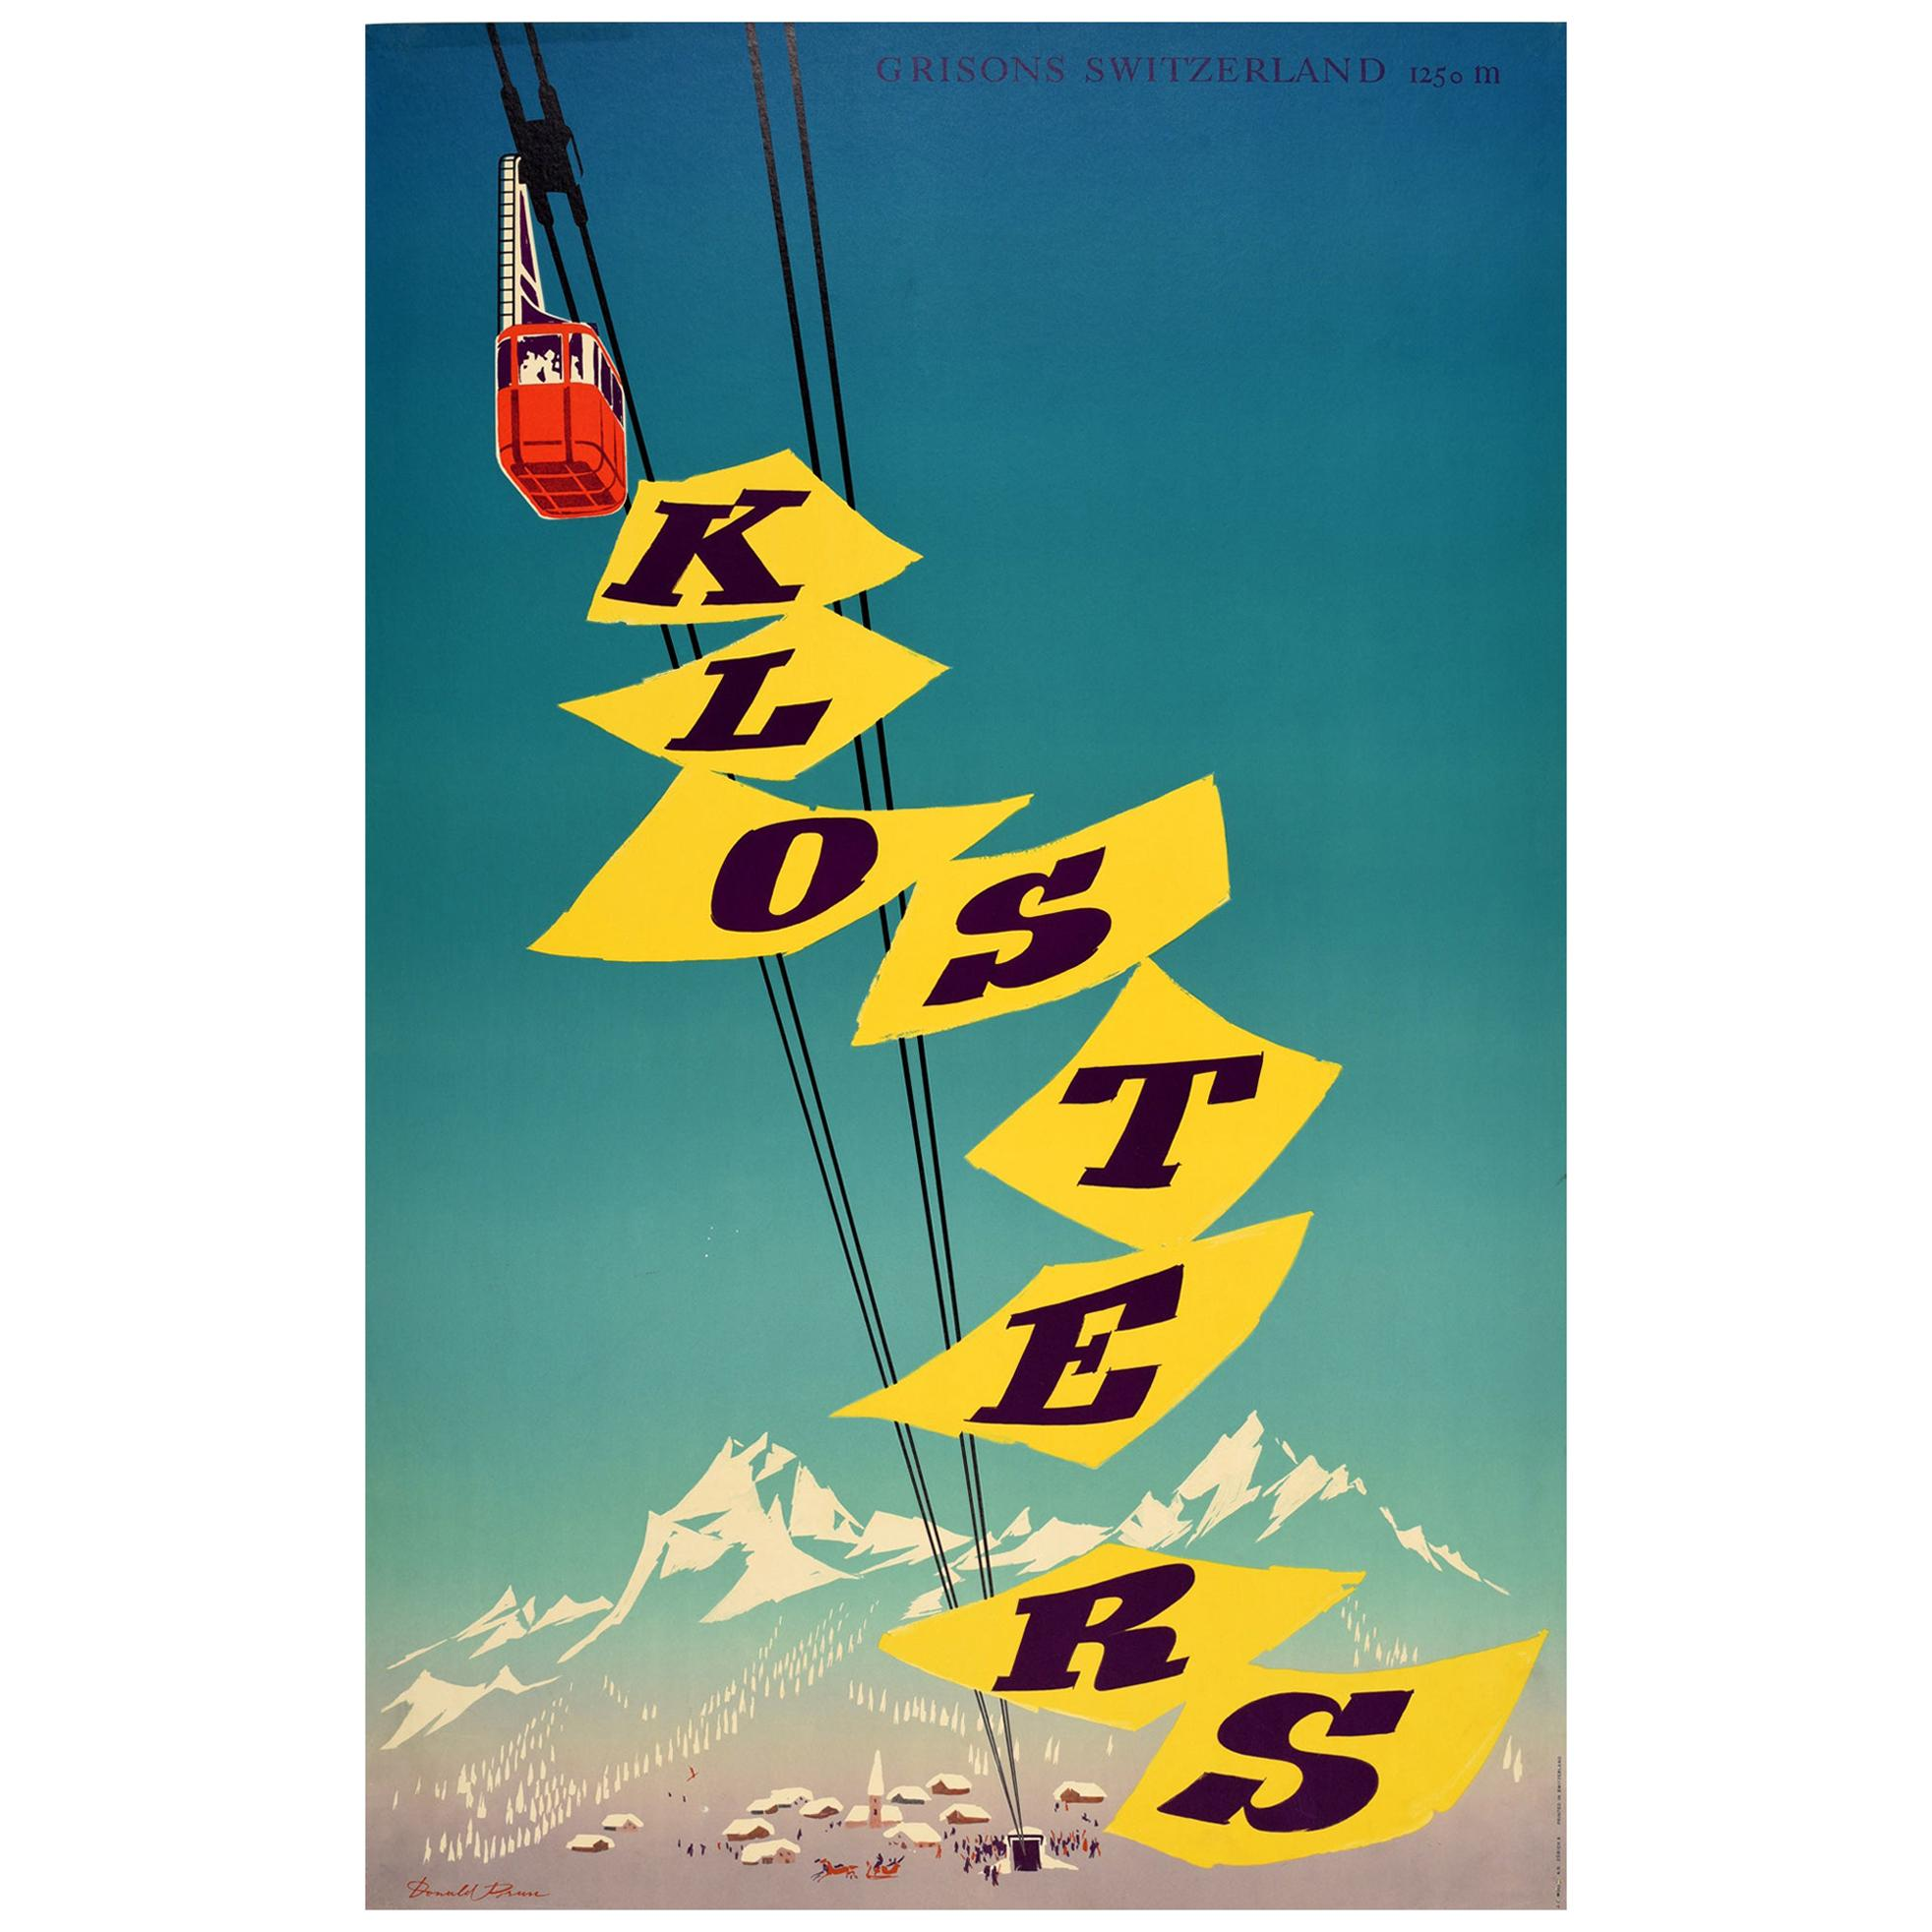 Original Vintage Poster Klosters Alpine Skiing Winter Sport Grisons Switzerland